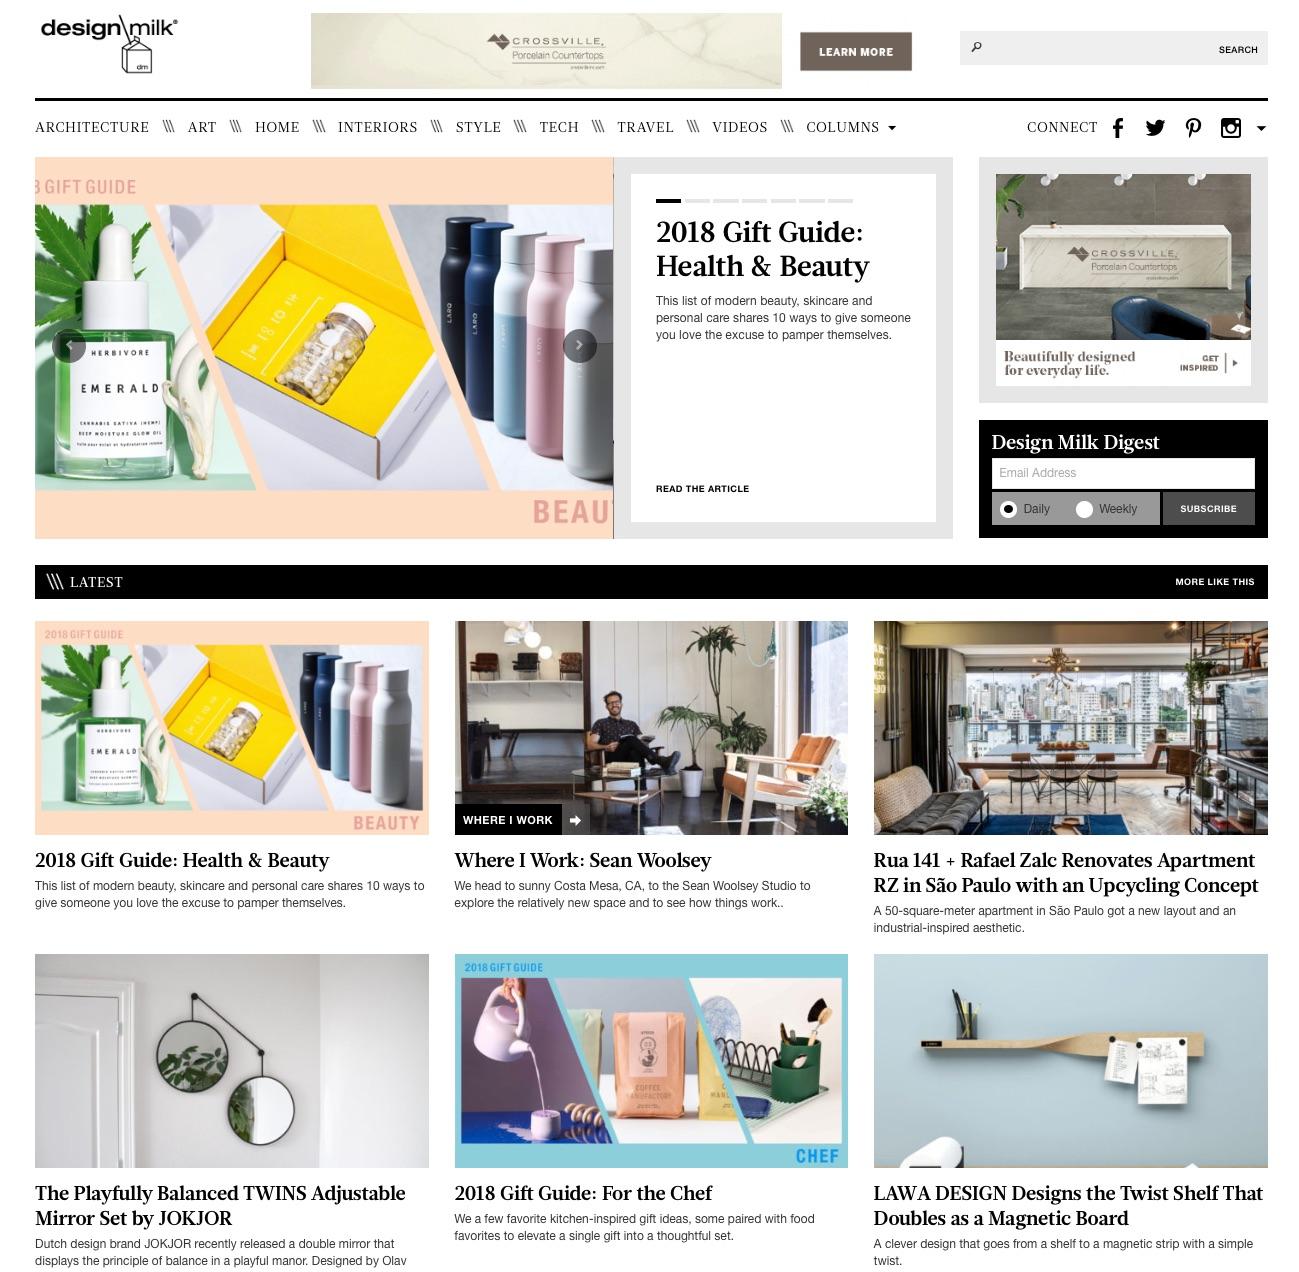 Design_Milk__Design_Blog_with_Interior_Design__Modern_Furniture____Art